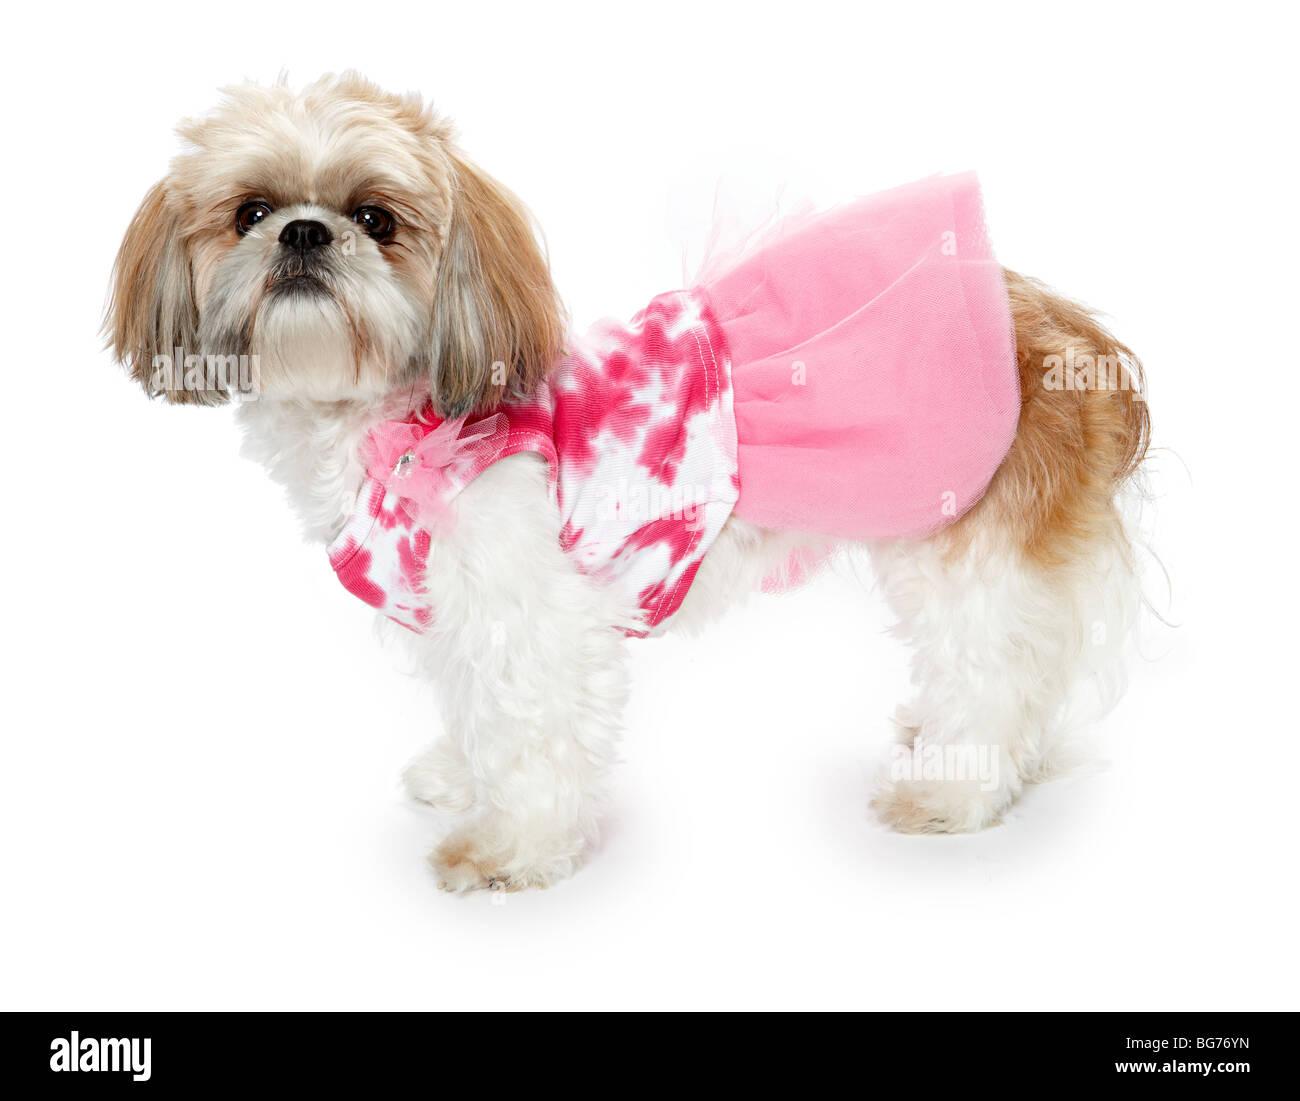 Shitsu Shih Tzu Dog In Pink Outfit Clothes Stock Photo Alamy